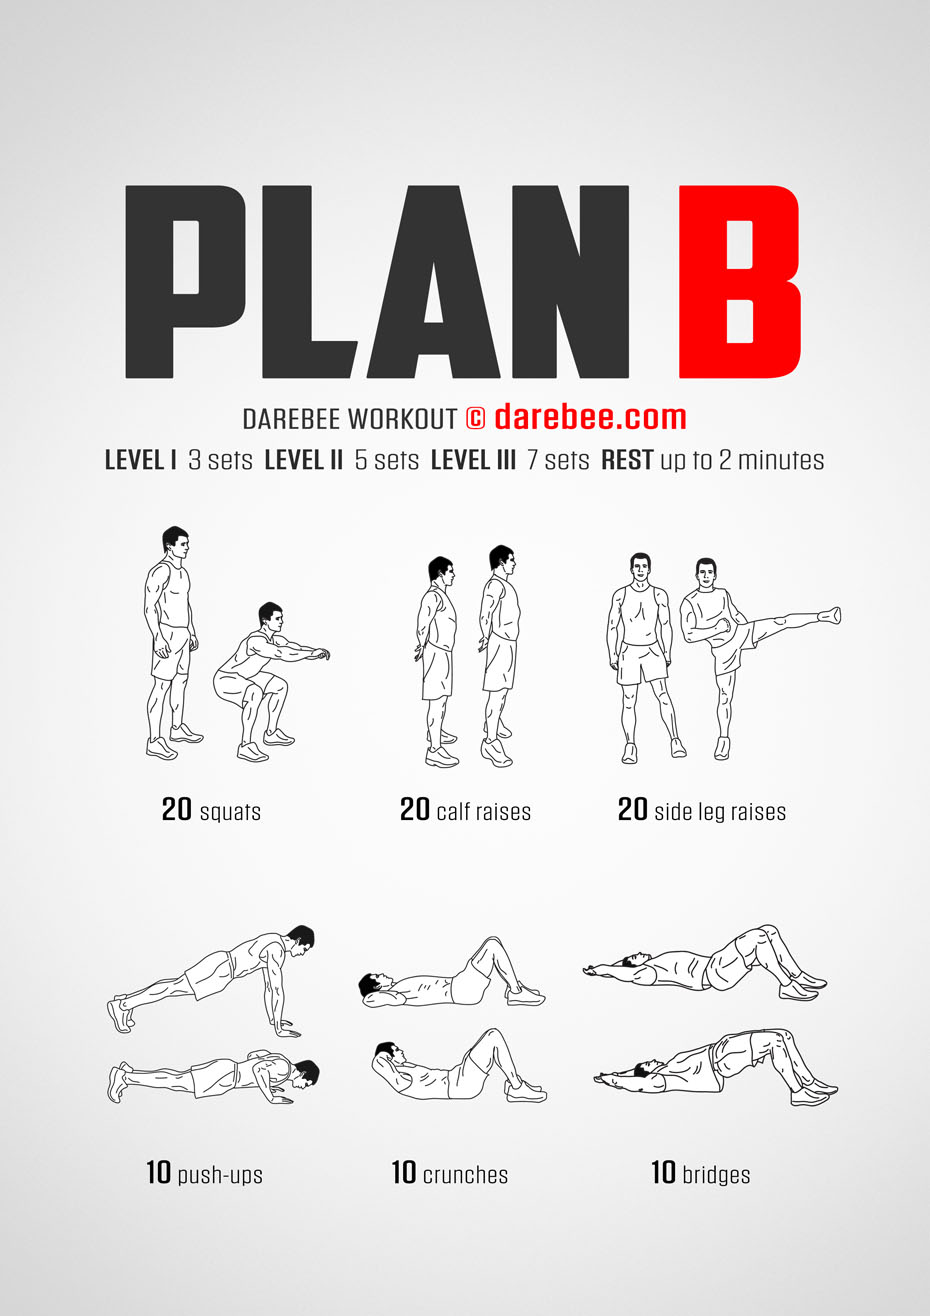 plan b workout